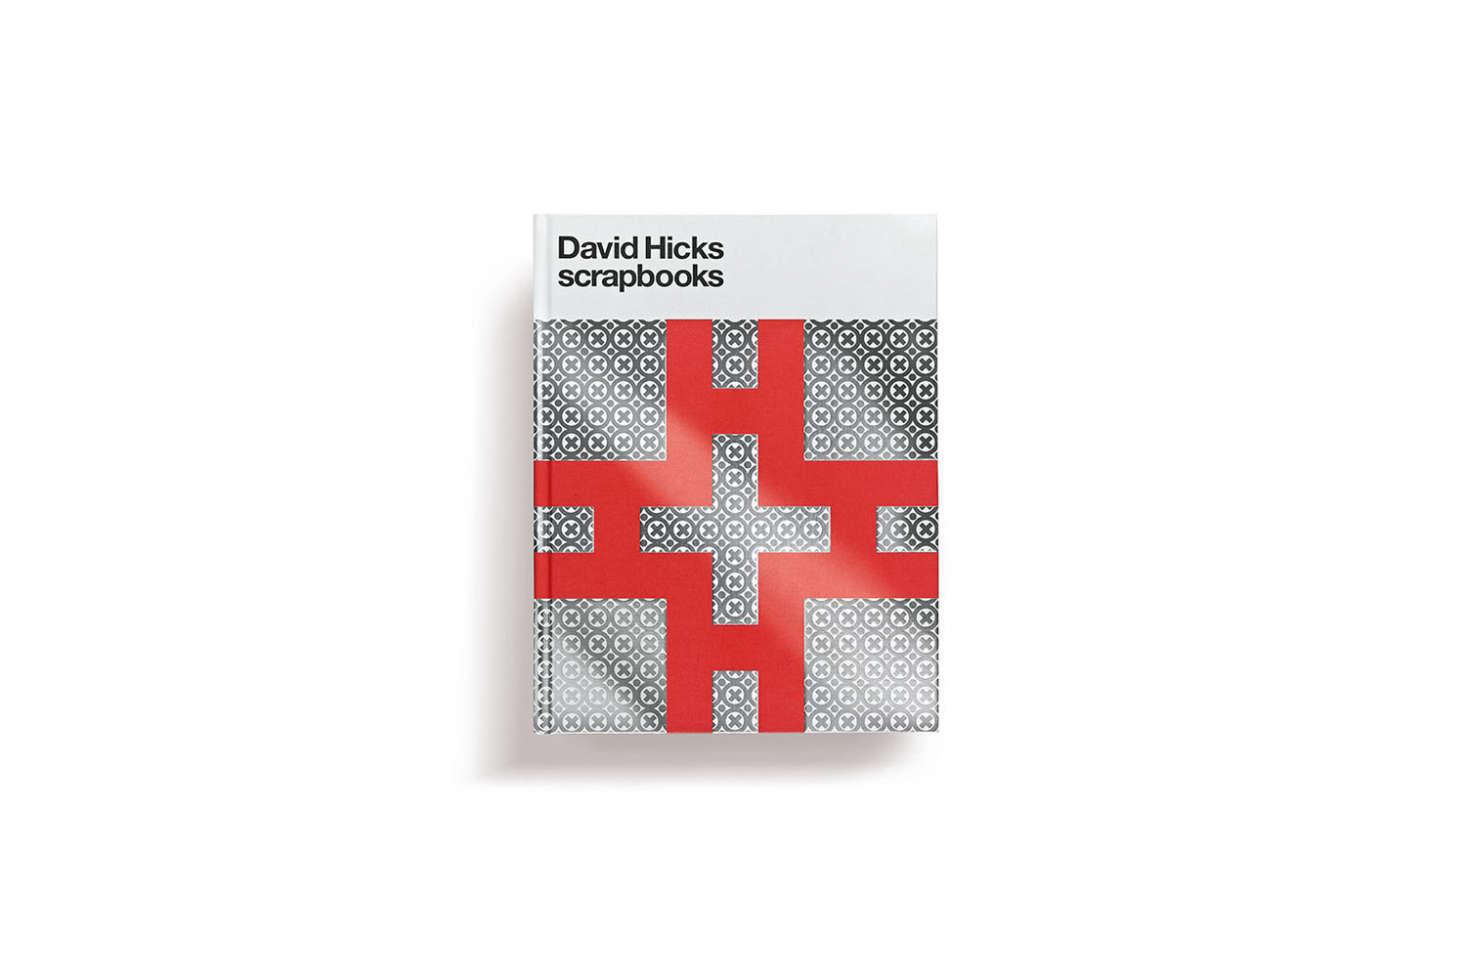 TheDavid Hicks Scrapbooksfrom the legendary designer is $46.39 from Amazon.